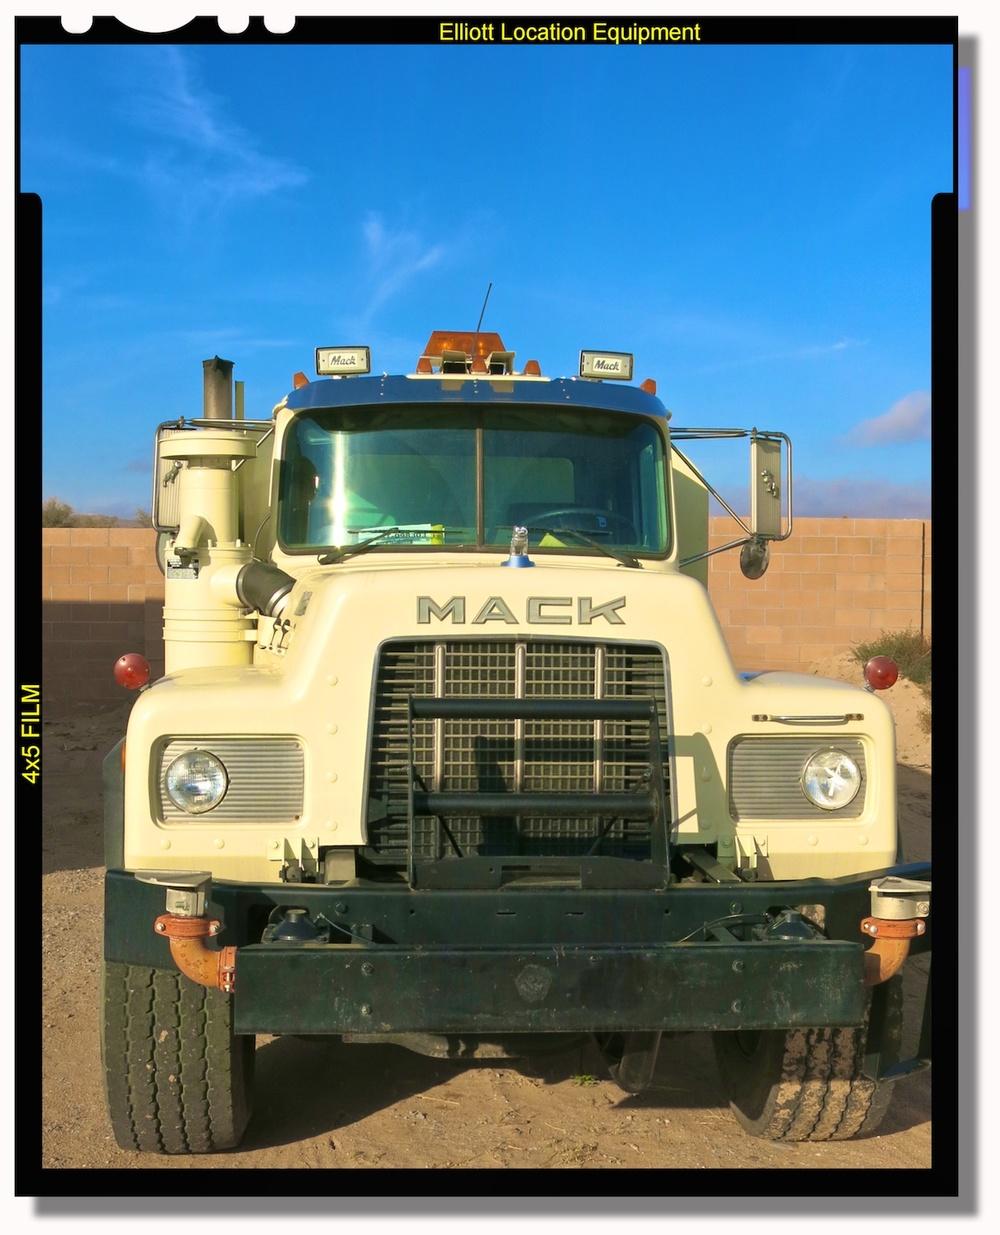 Water Truck PicCar 3543.jpg